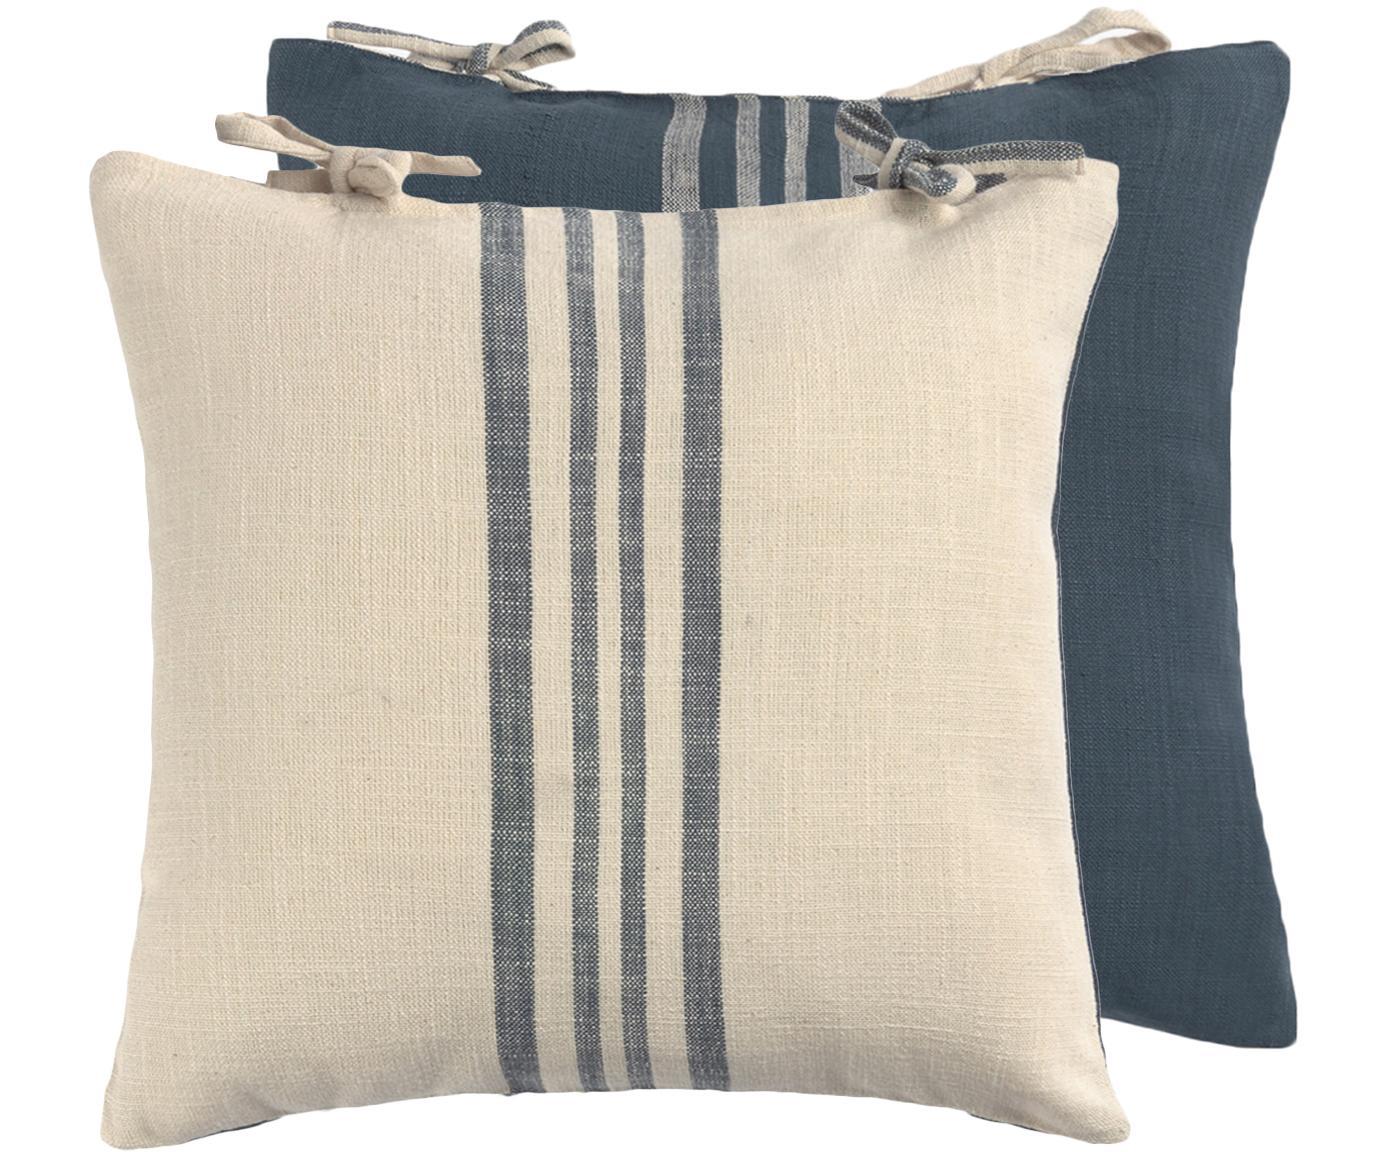 Federa arredo reversibile Caspio, Cotone, Blu, Beige, Larg. 45 x Lung. 45 cm